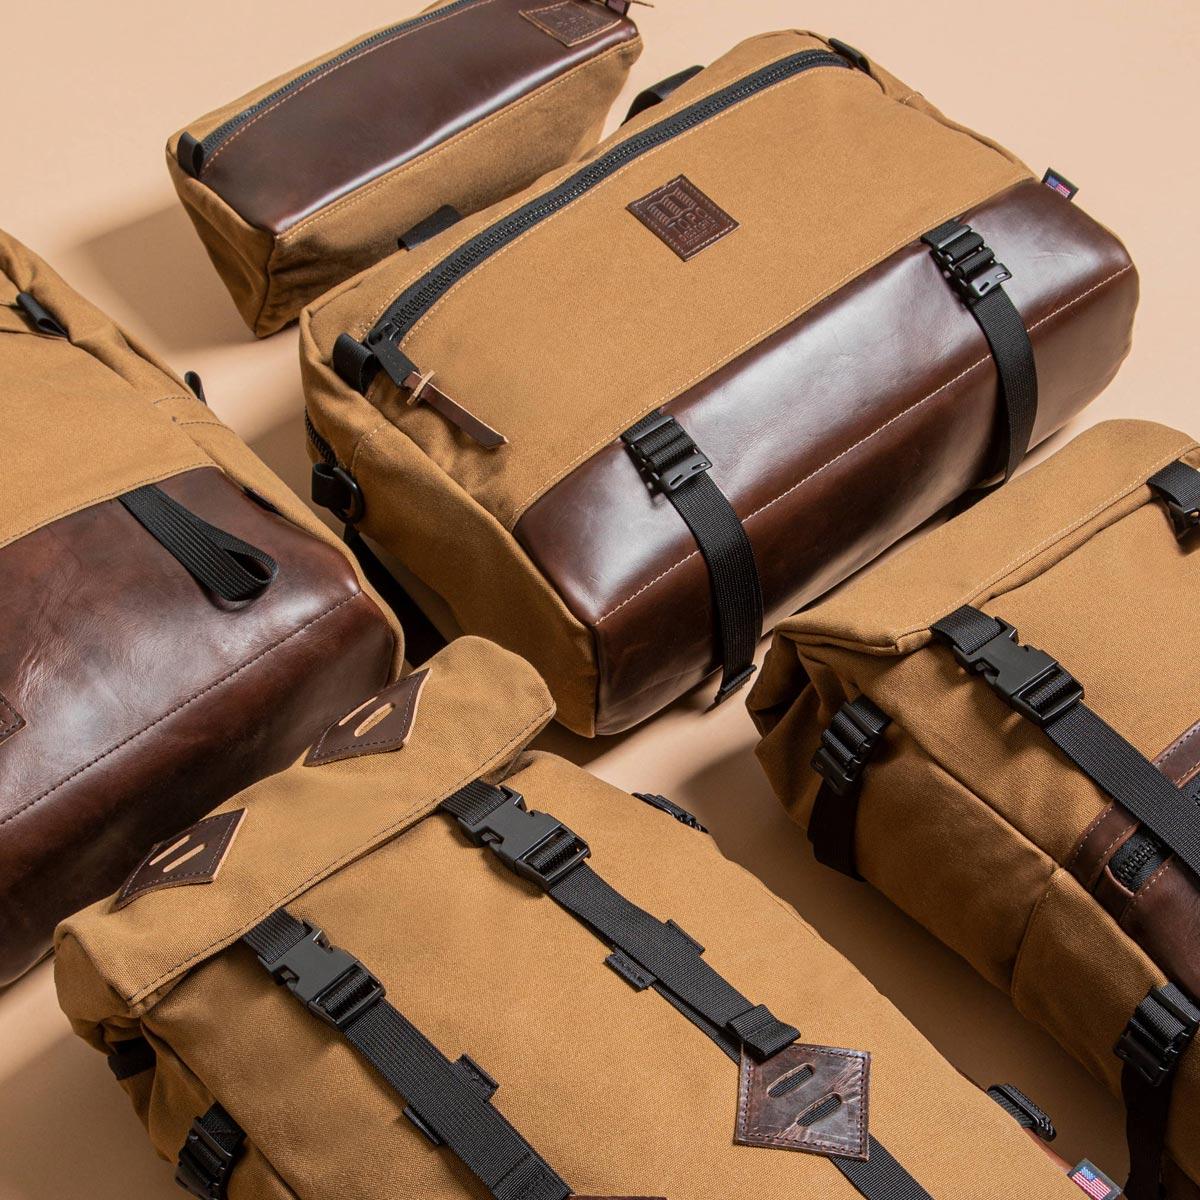 Topo Designs Commuter Briefcase Heritage Dark Khaki Canvas/Dark Brown Leather, aktetas, schoudertas en rugzak in één